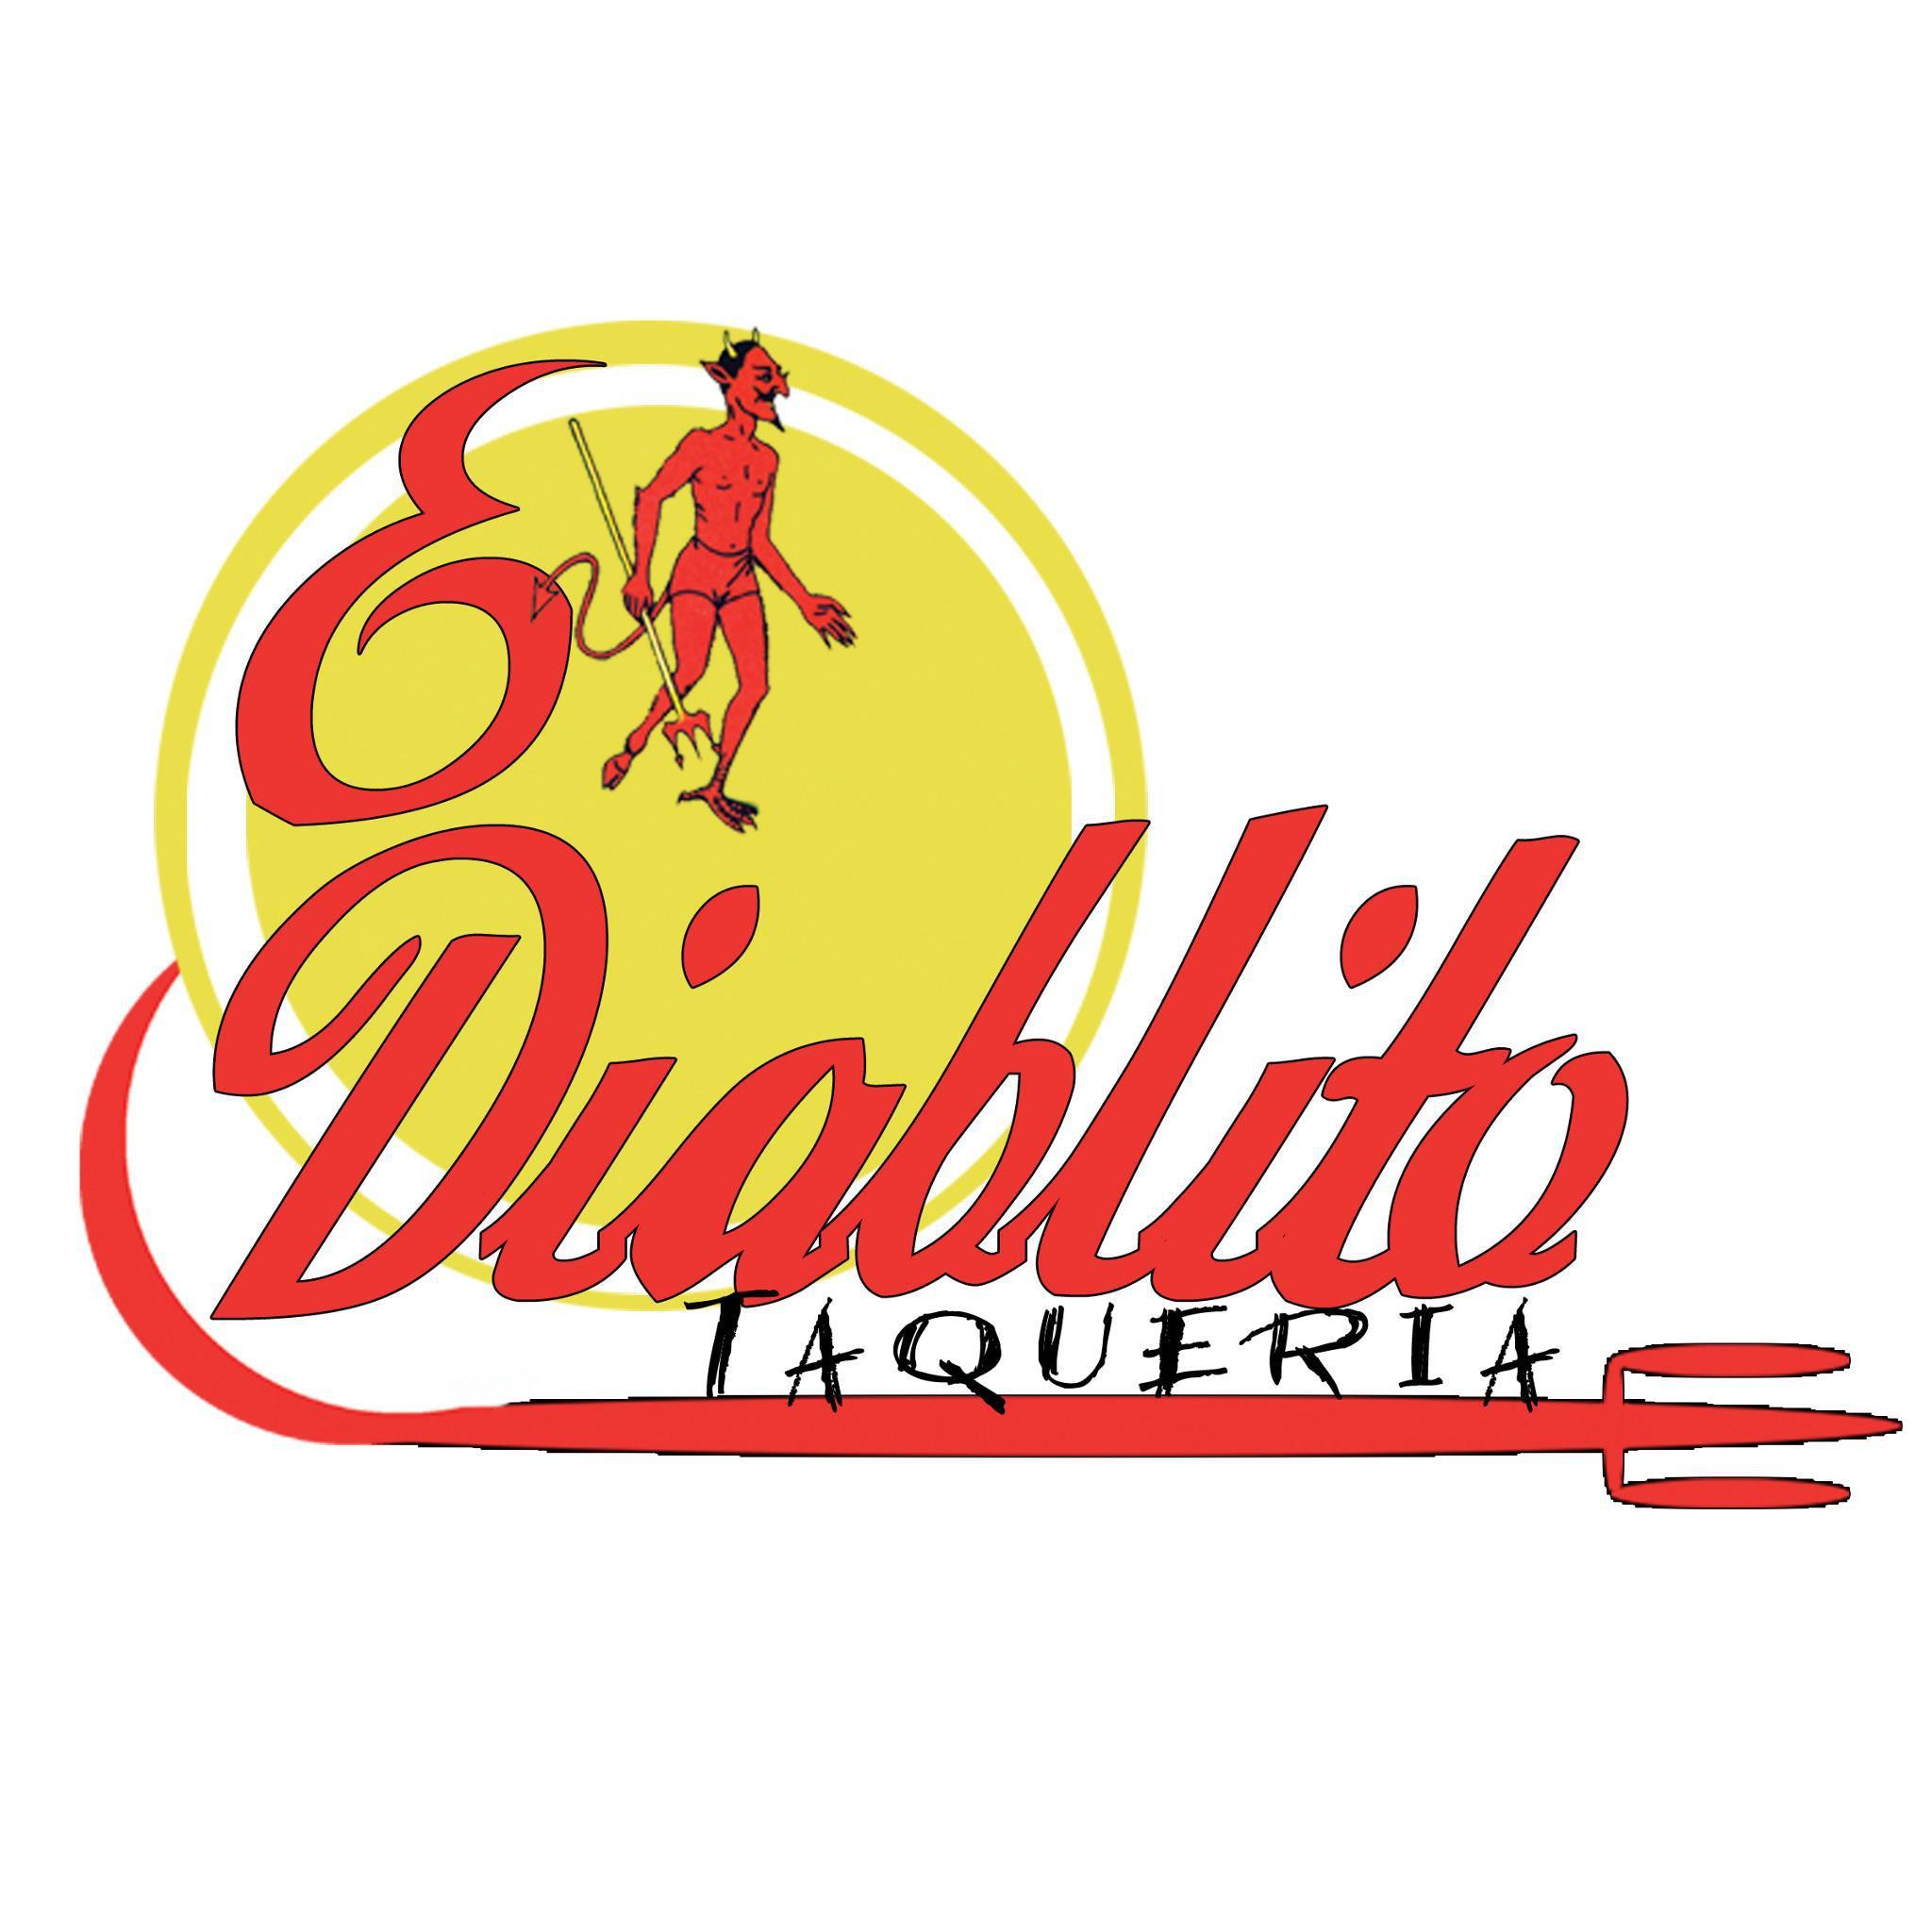 El Diablito Taqueria Logo